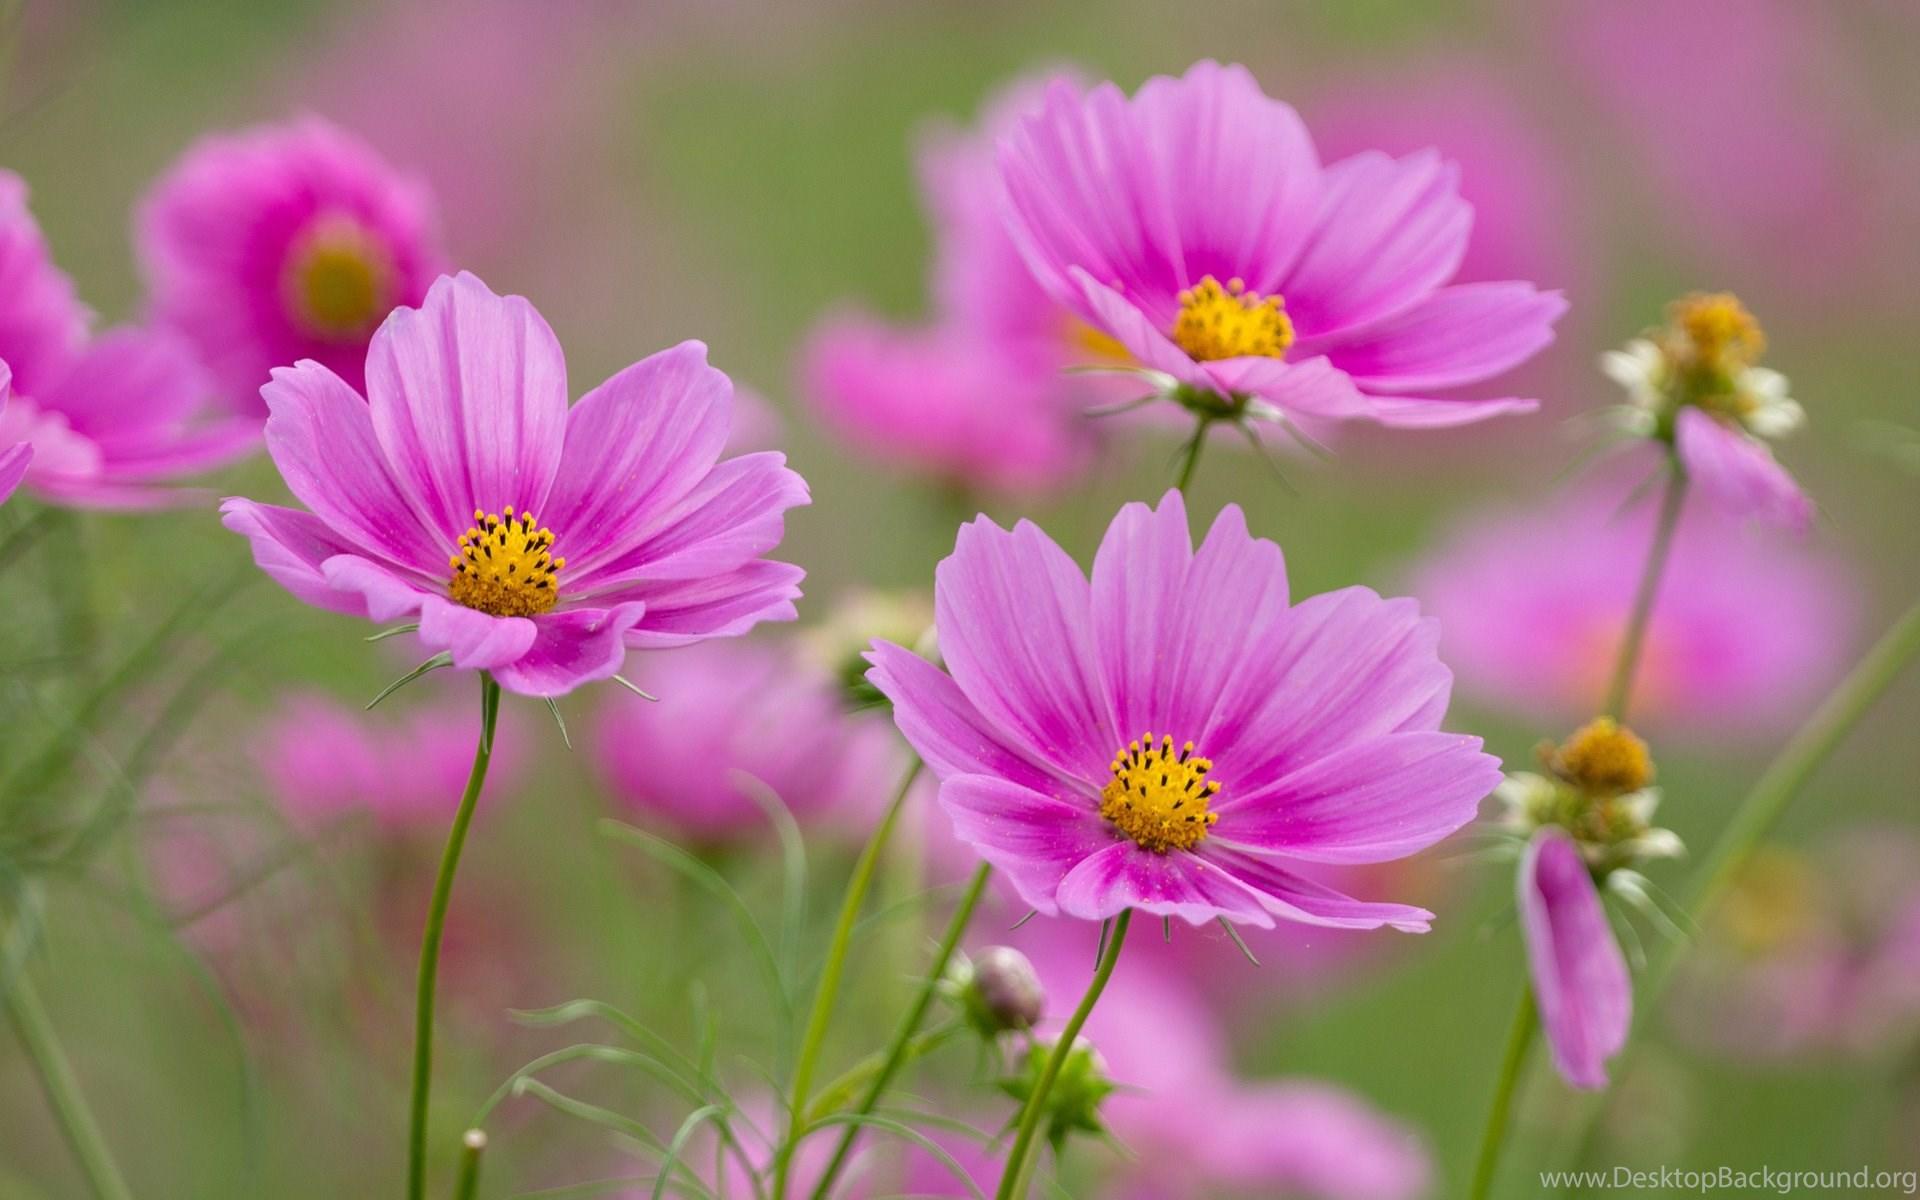 Lovely Pink Flowers Wideg Desktop Background